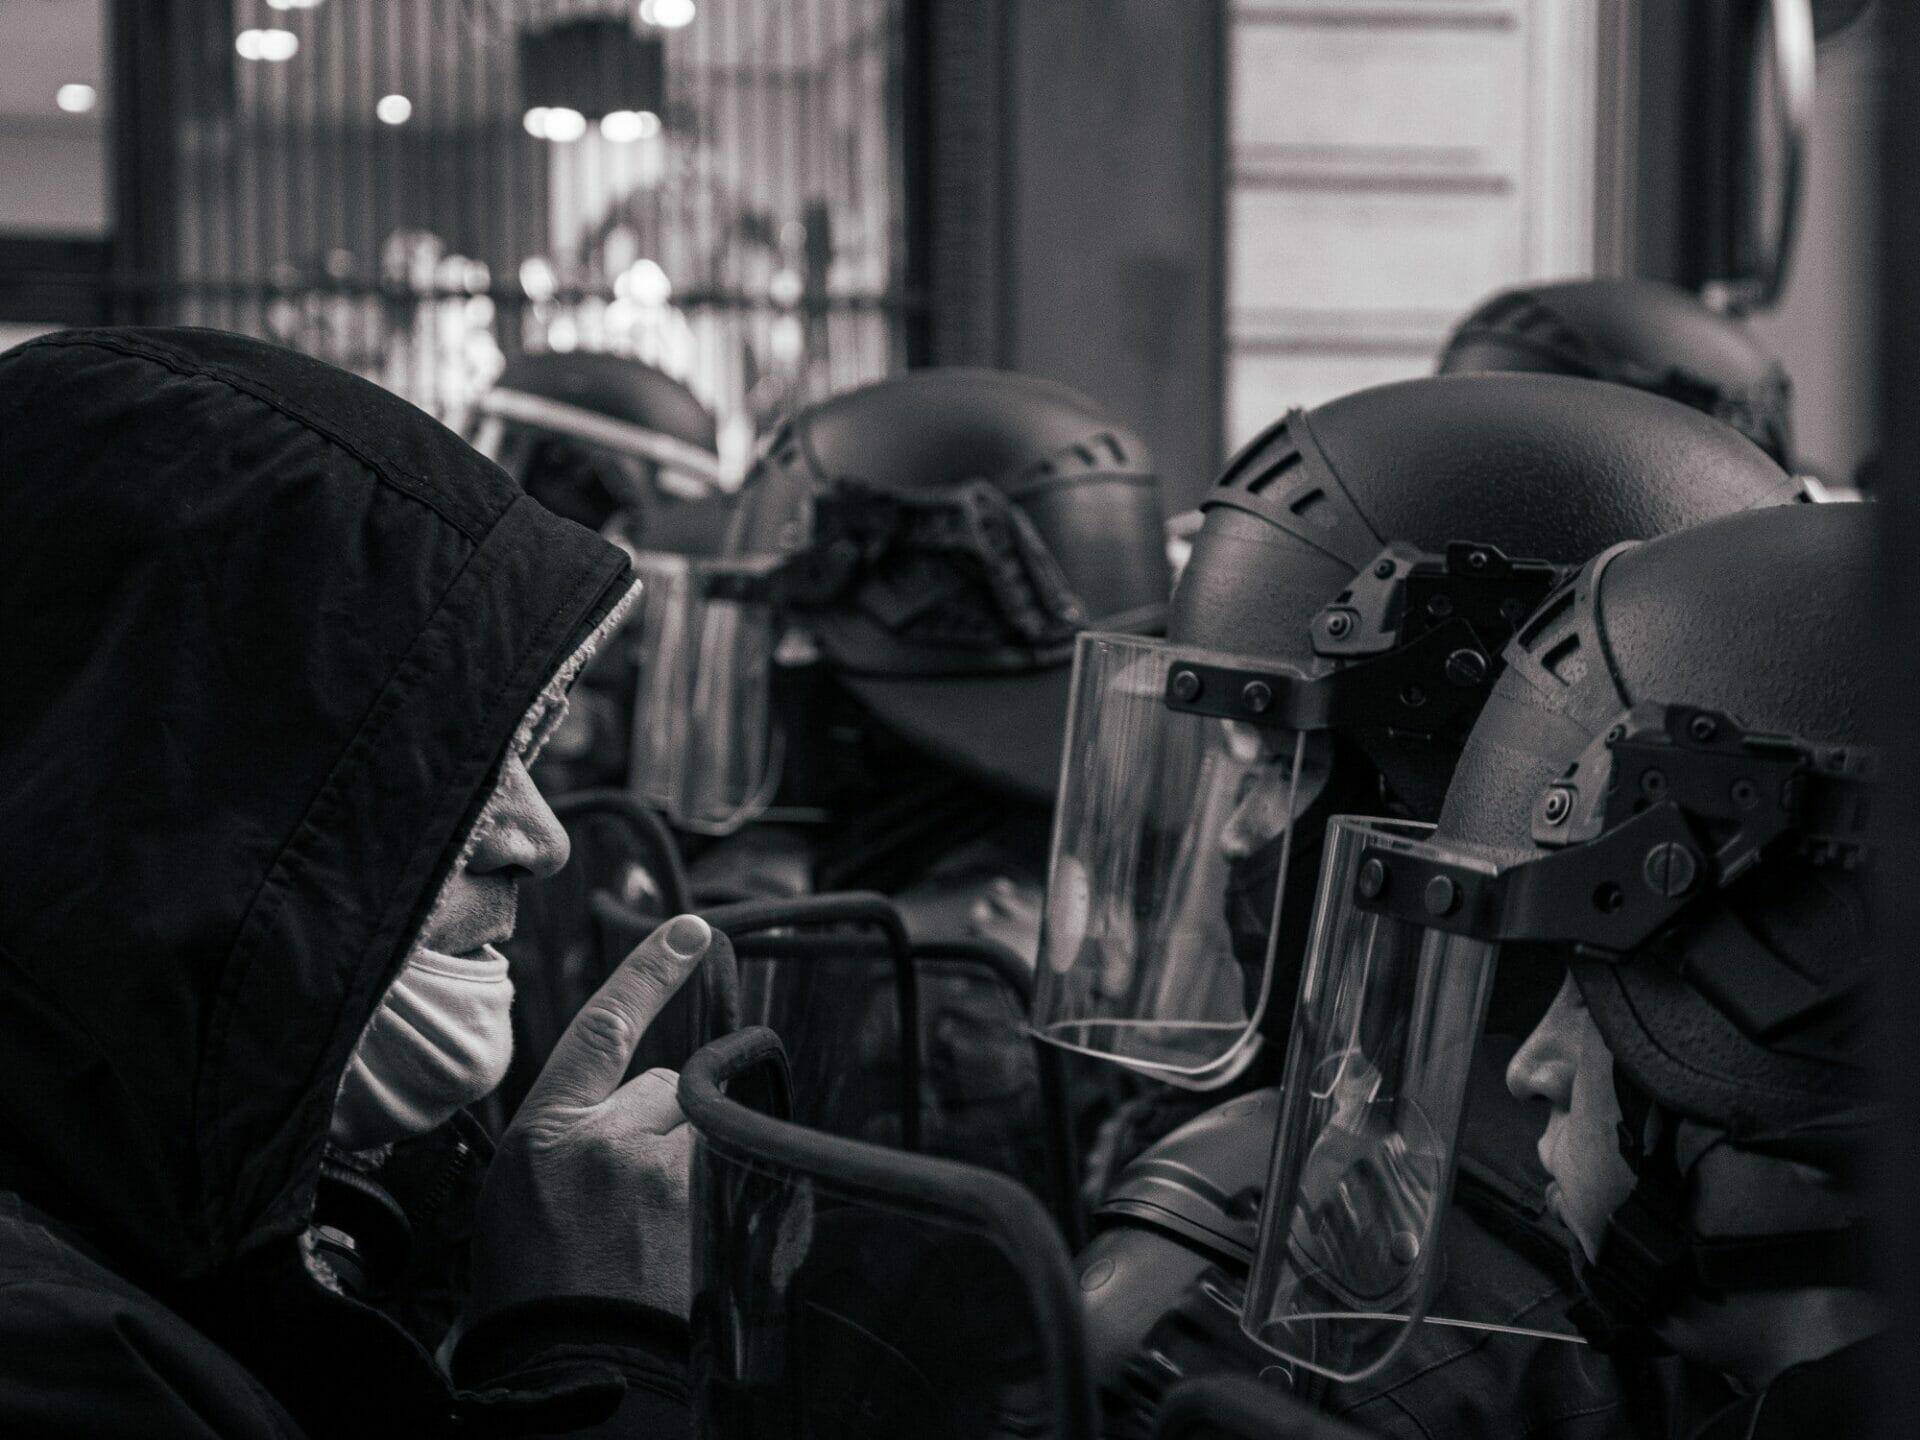 https://direitonovo.com/wp-content/uploads/2021/09/grayscale-photo-of-motorcycle-helmet-and-helmet_bb87d2f7384ba676f384150b0ce02b6f_2000.jpg